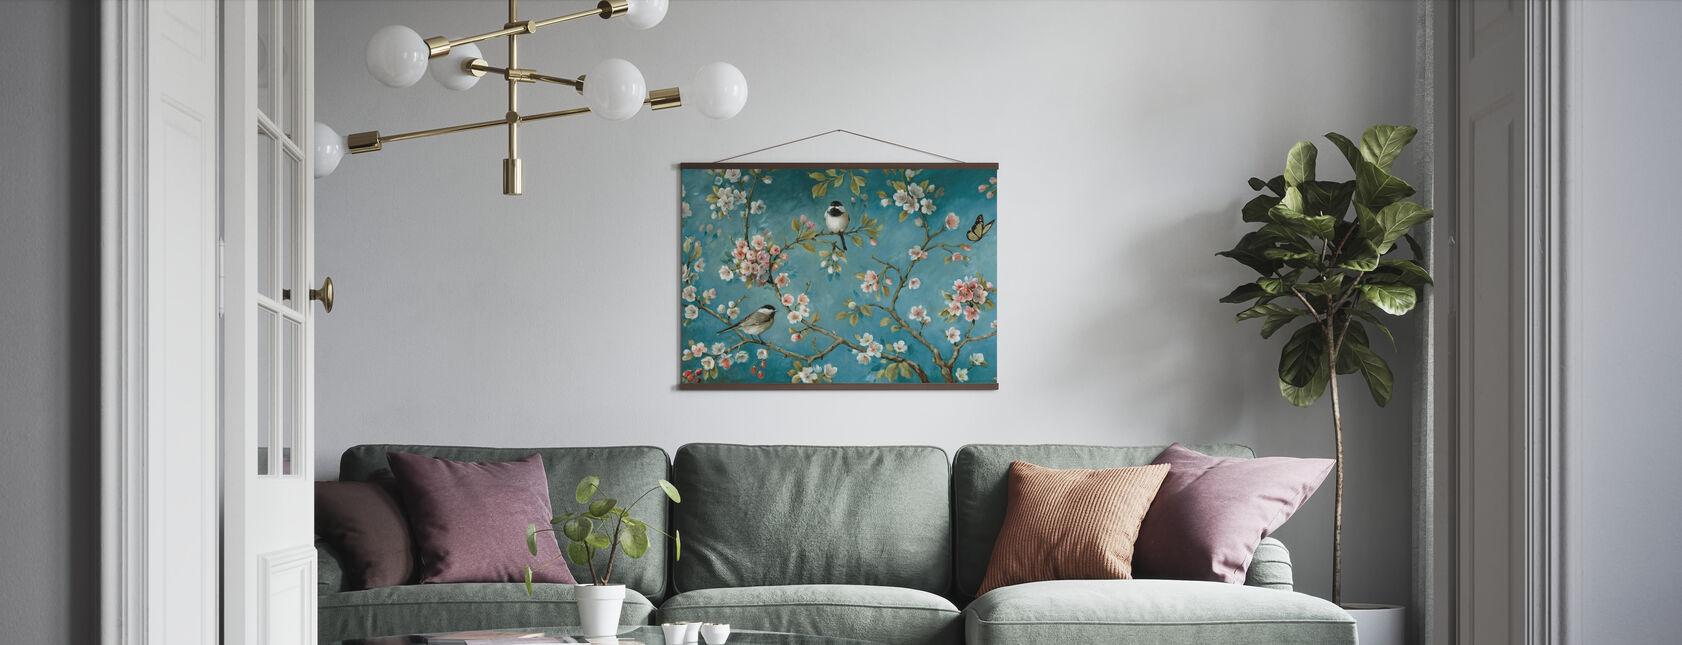 Blossom - Plakat - Stue